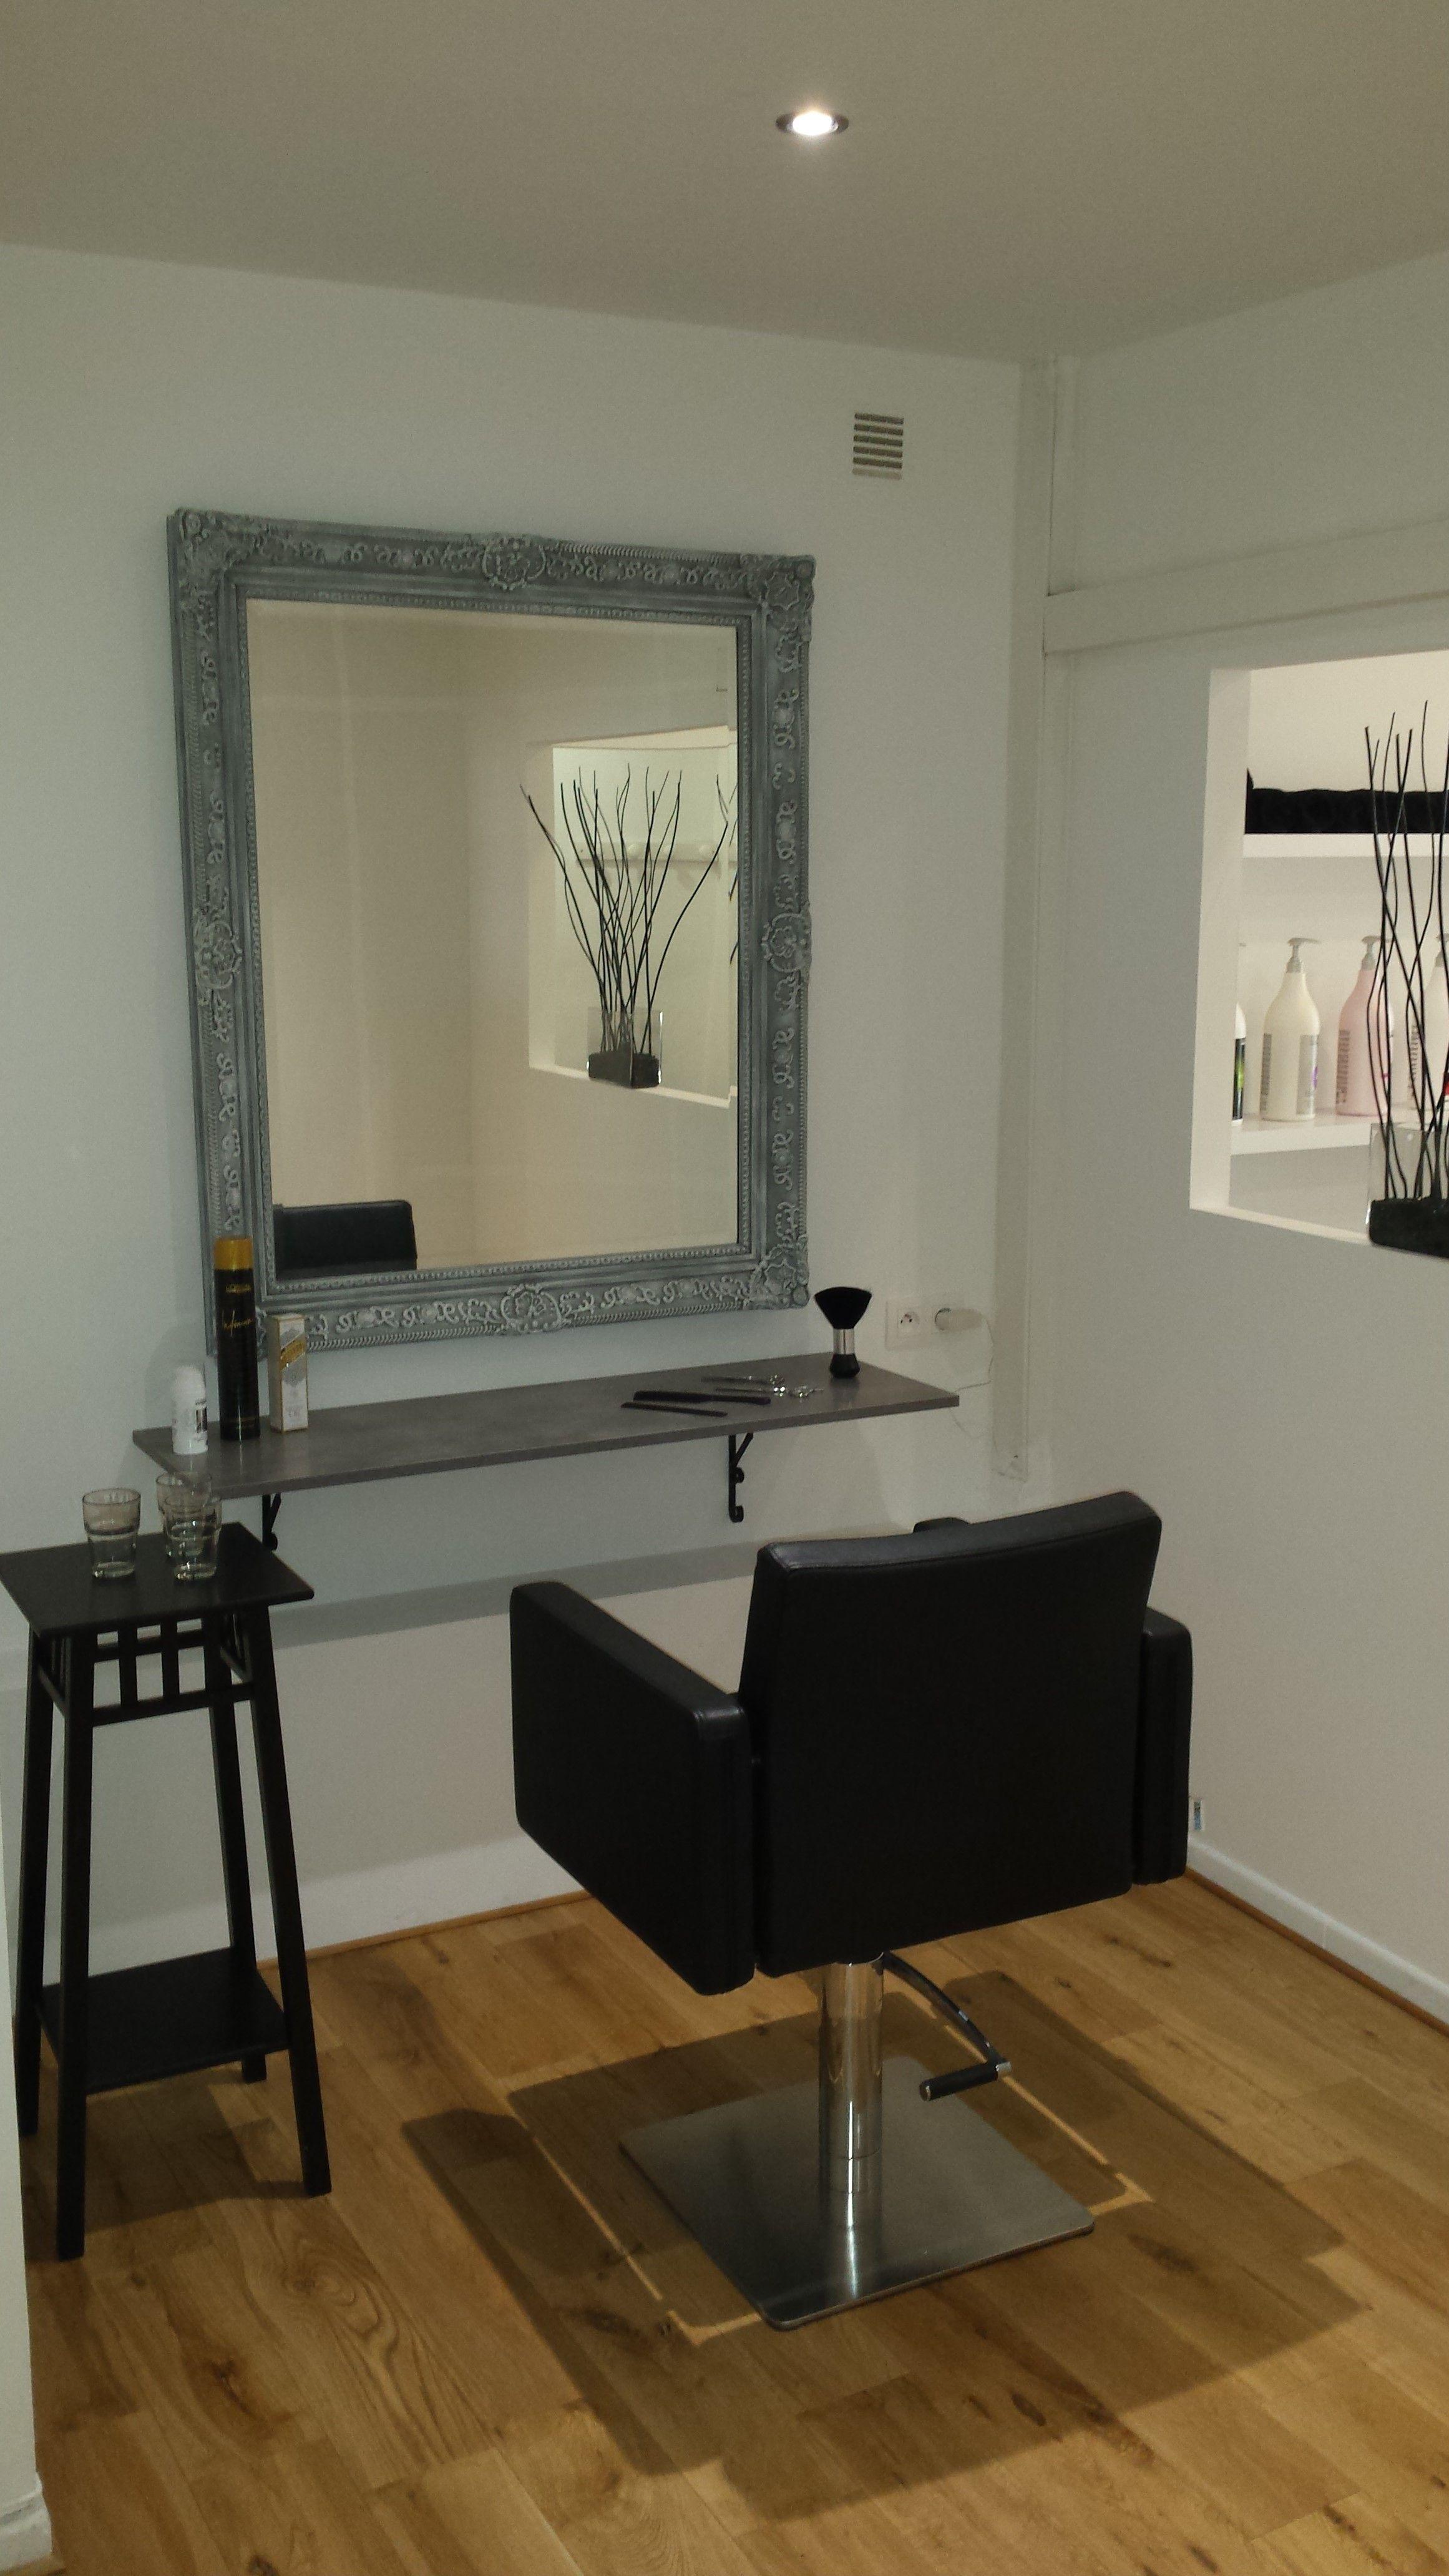 salon de coiffure chignons mariage privatif | Wohnen und Friseur